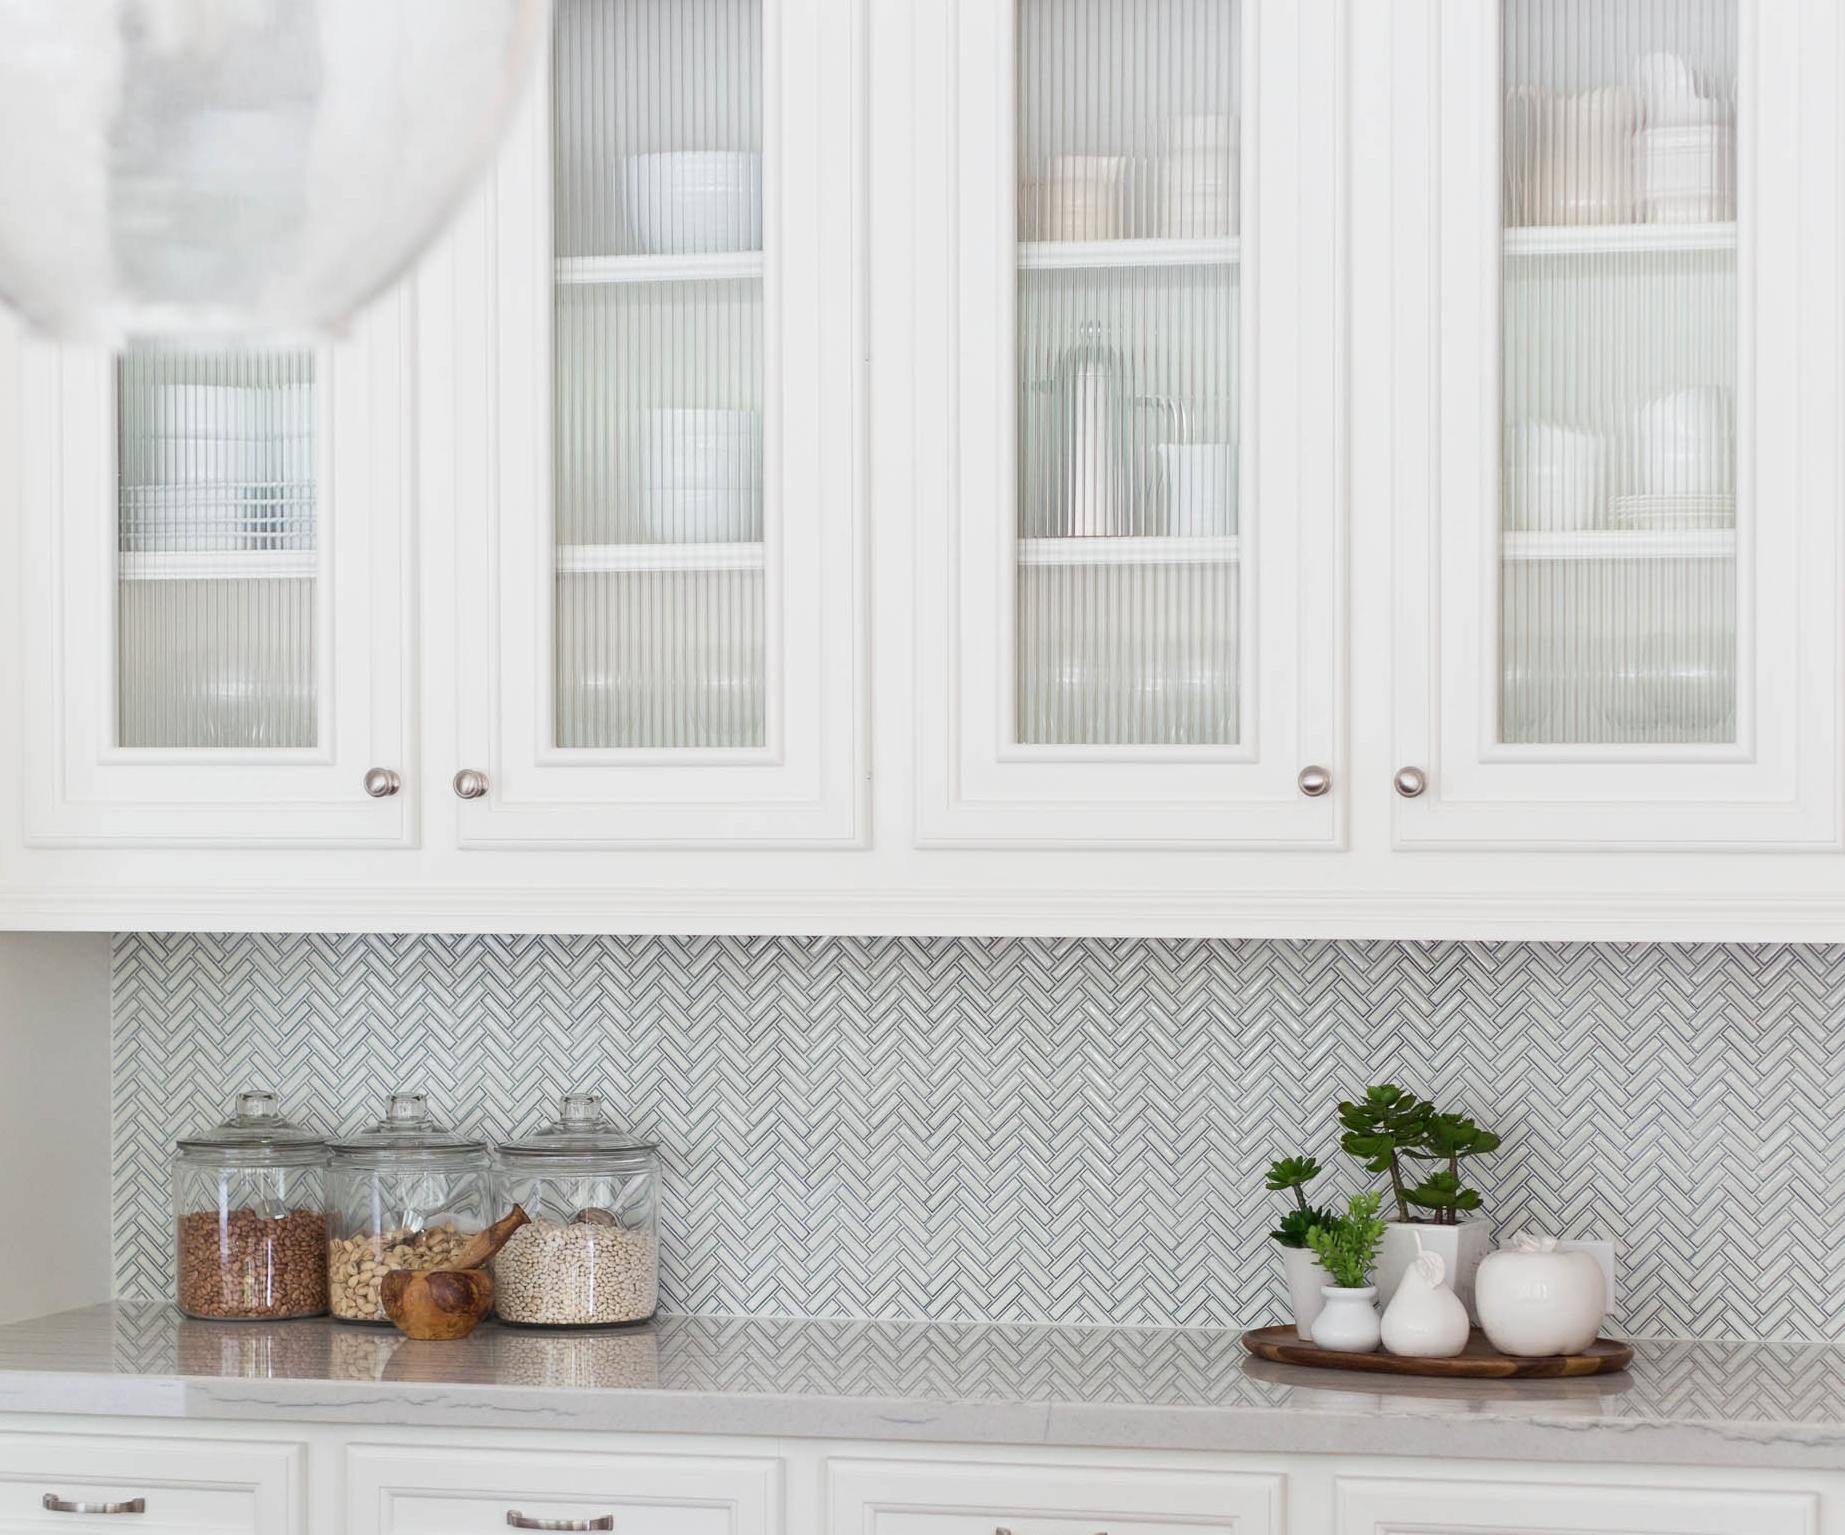 Kitchen remodel   Interior Designer: Carla Aston / Photographer: Tori Aston